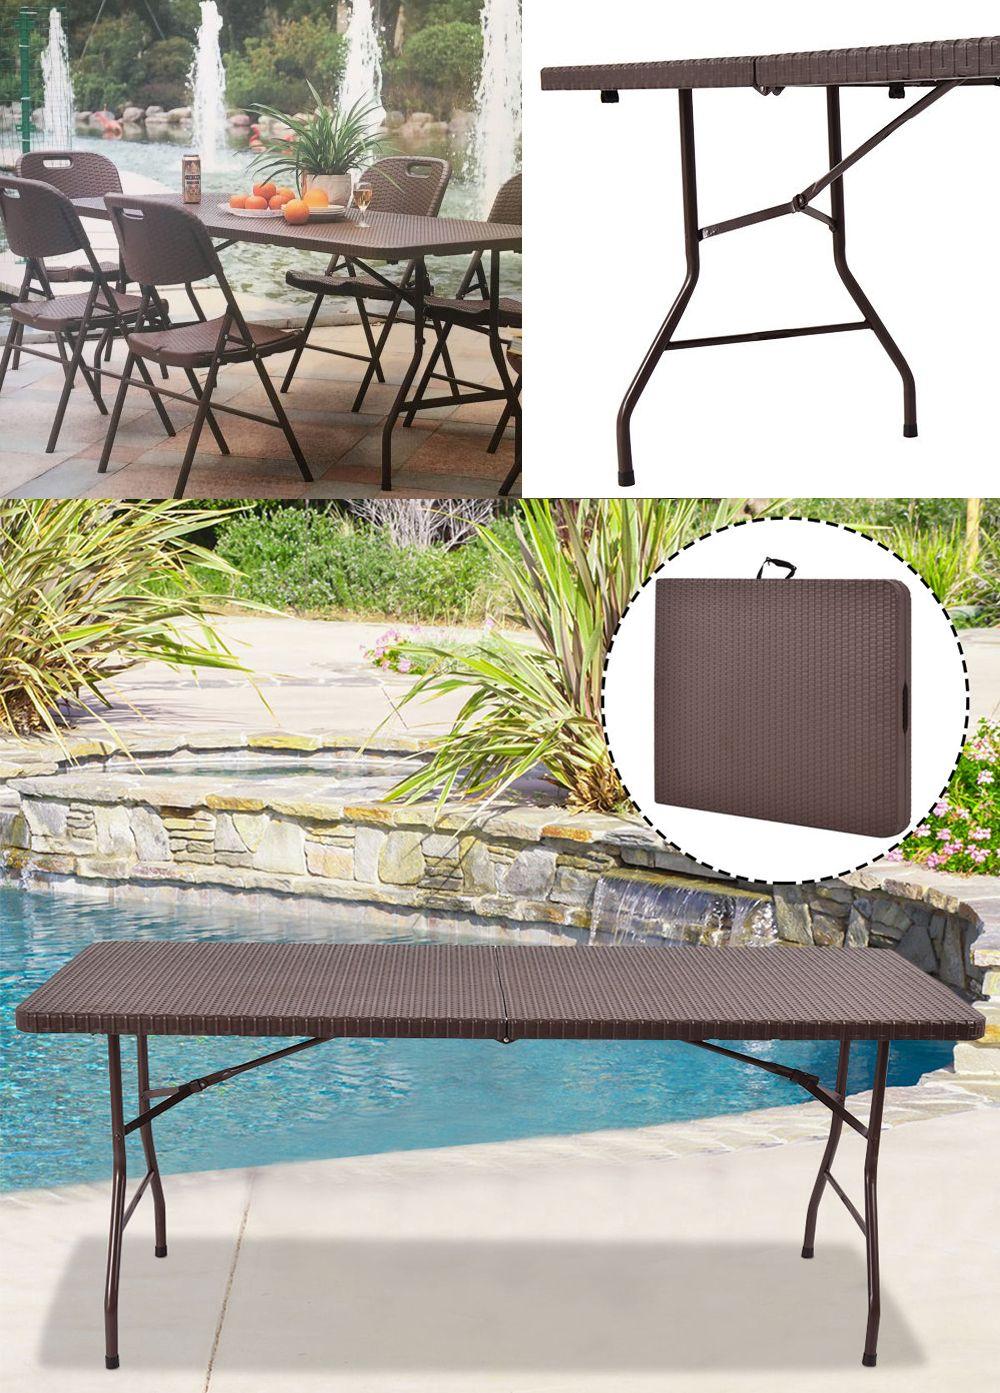 Rattan Stol Skladany Ogrodowy Ratanowy Bankiet 180 7587868566 Allegro Pl Outdoor Furniture Sets Outdoor Furniture Furniture